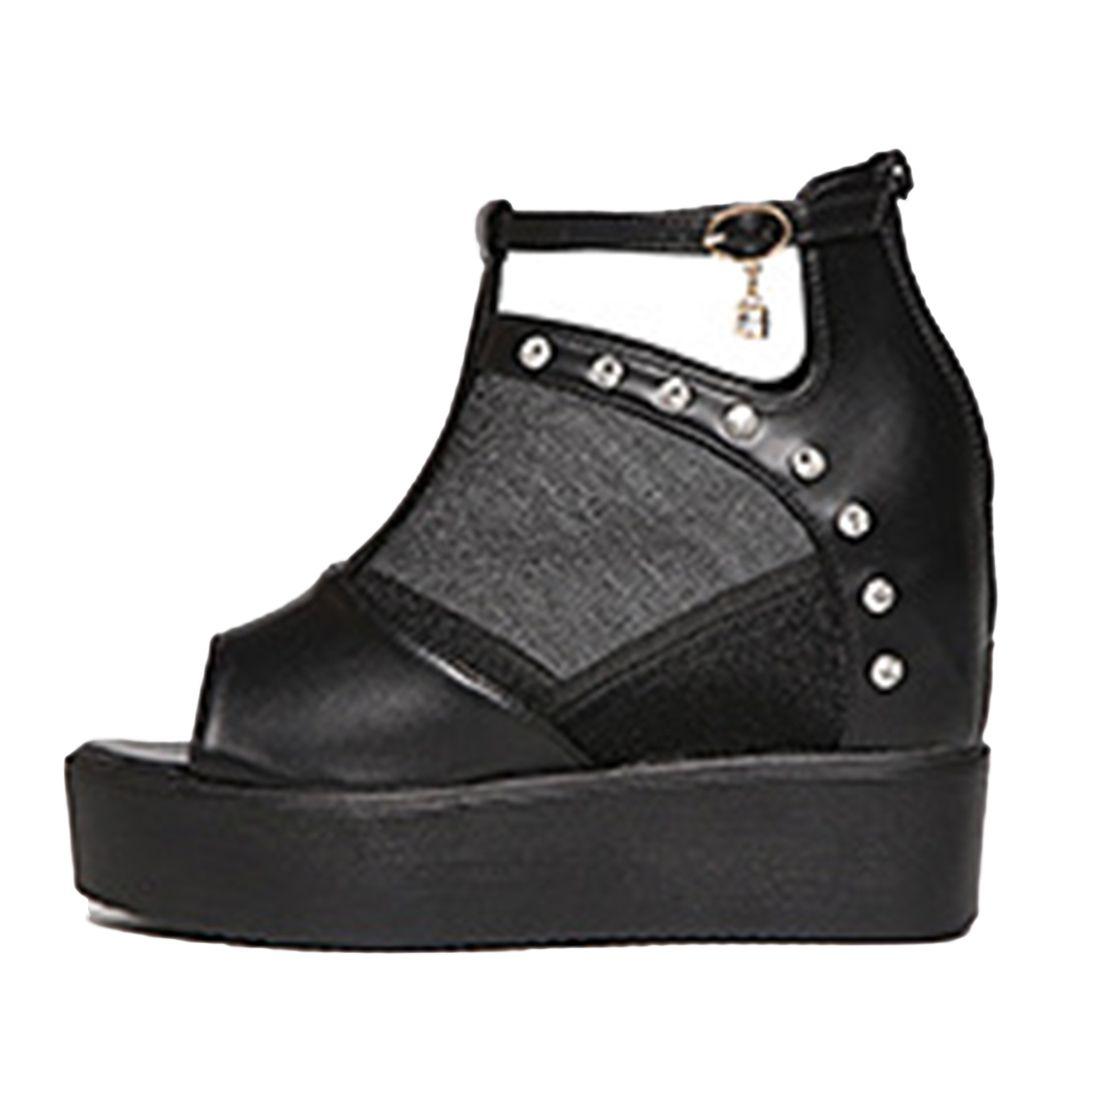 Womens sandals wedges - Womens Sandals High Heel Rhinestones Sandals Women Open Platform Shoes Ladies Wedge Heel Summer Shoes